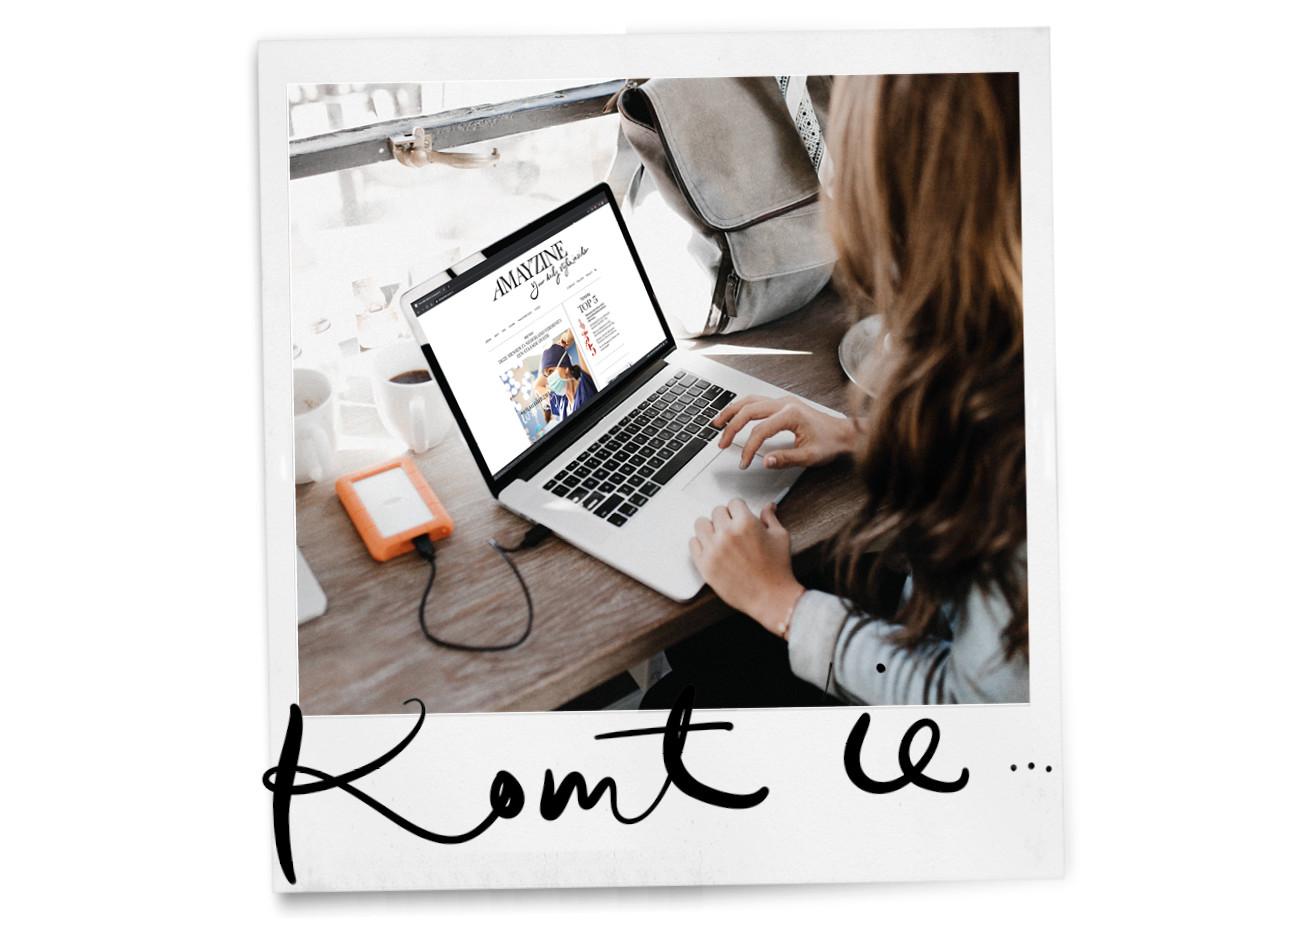 vrouw achter laptop thuis werken